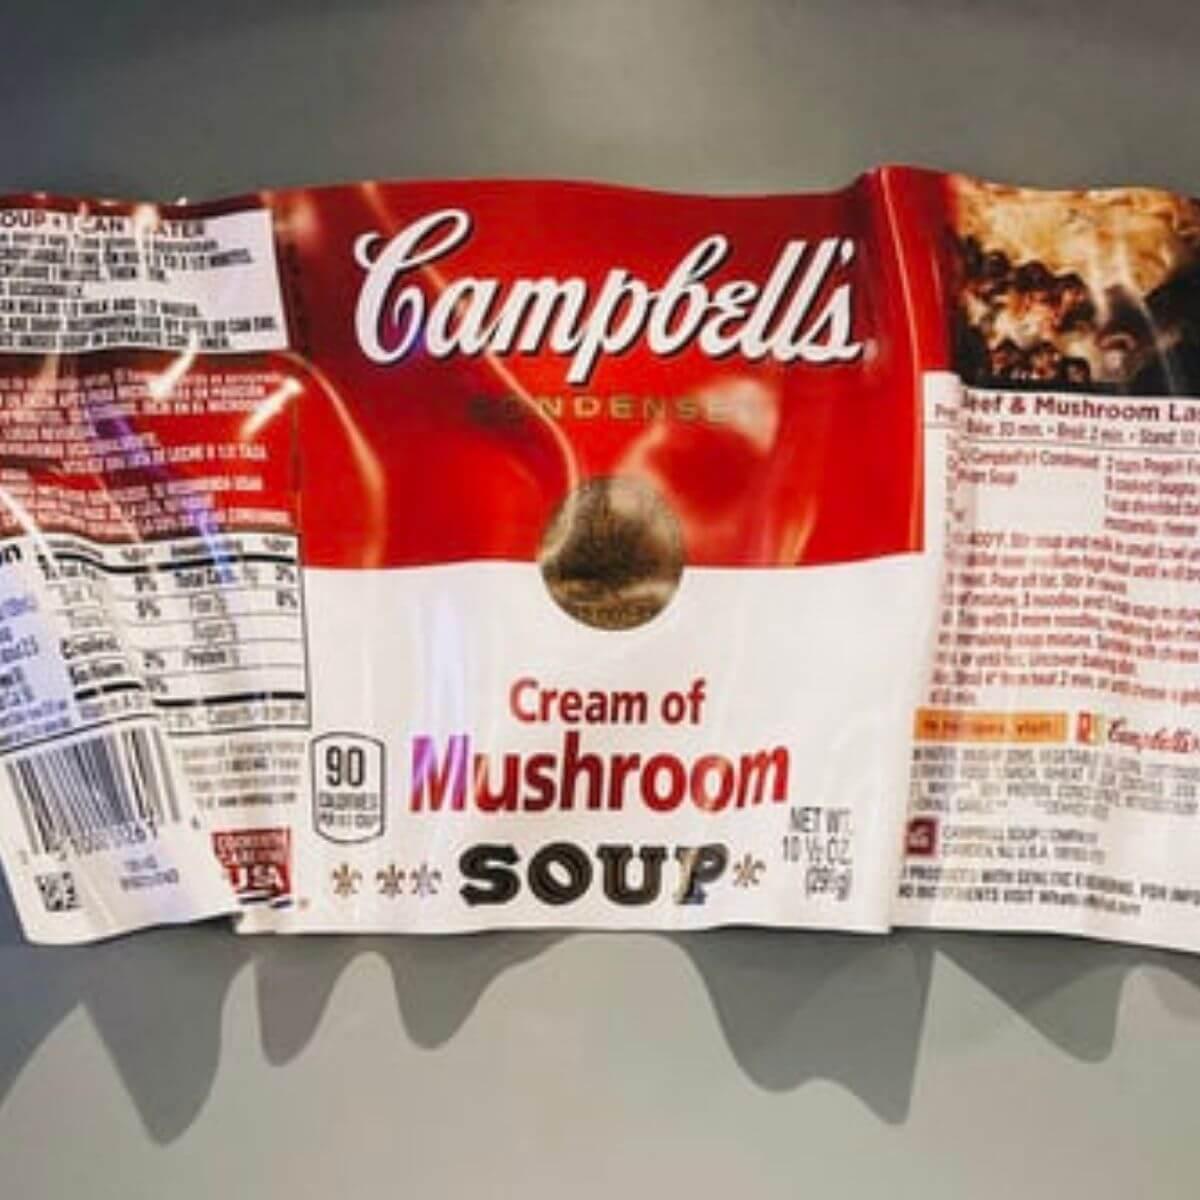 Campbells soup food label